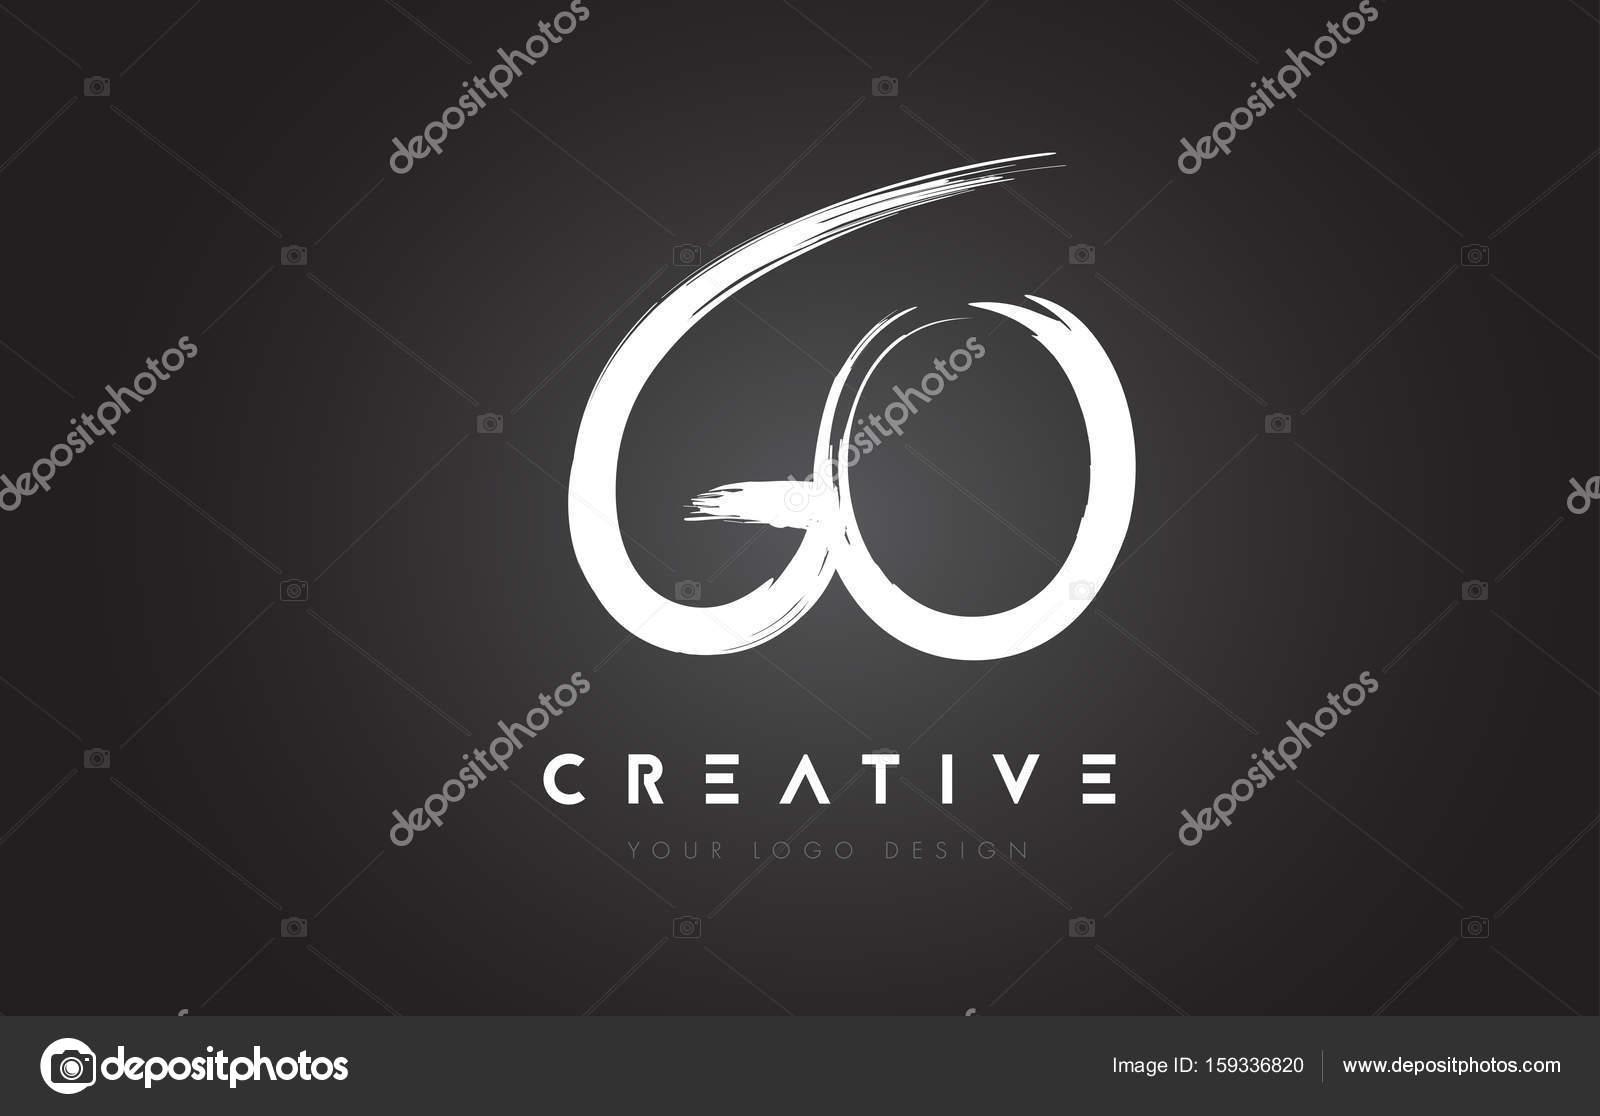 Allez Brosse Lettre Logo Design Des Lettres Manuscrites